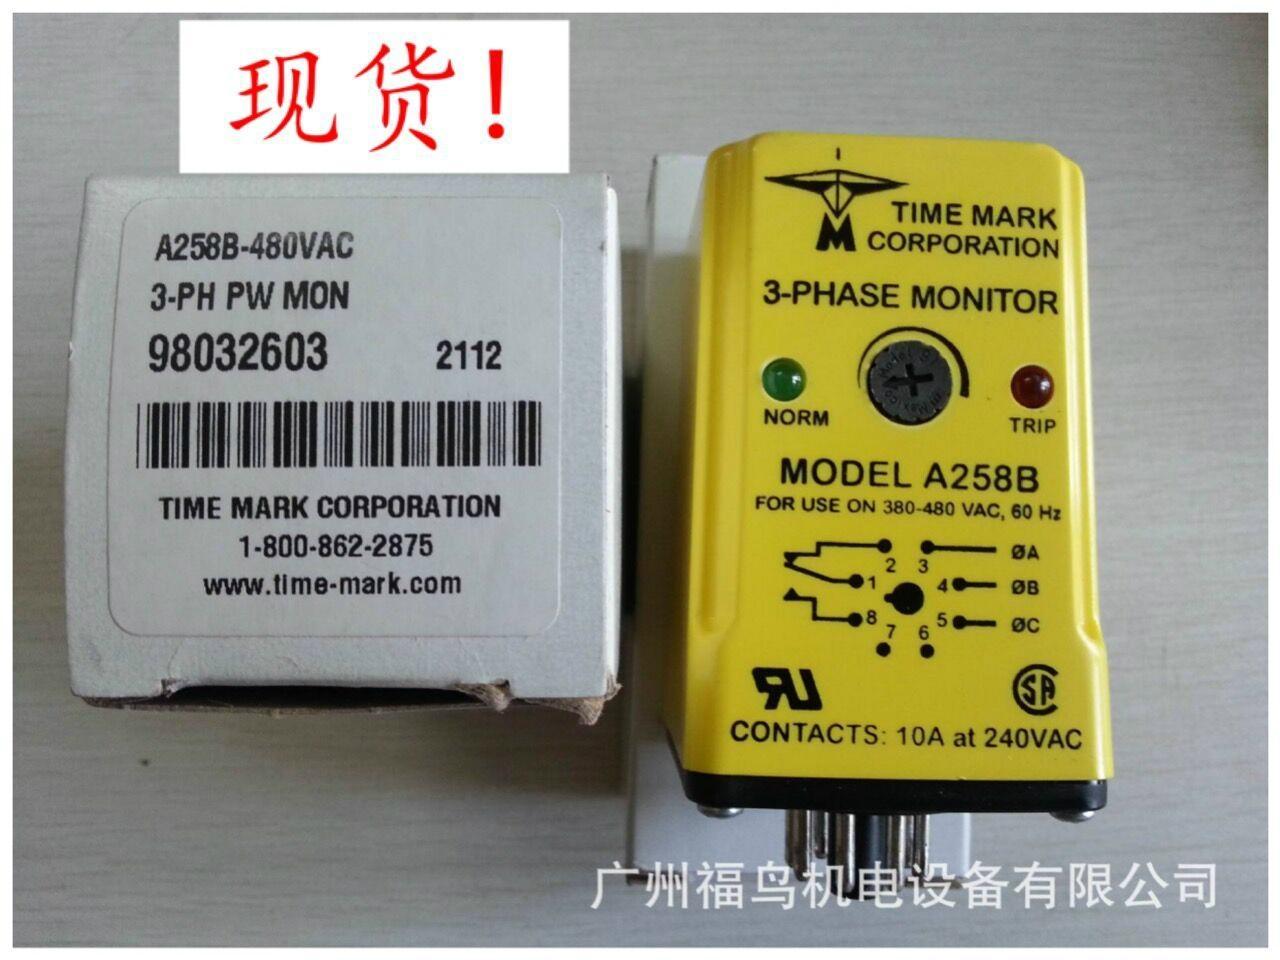 TIME MARK相序检测器, 三相监控器, 型号: A258B